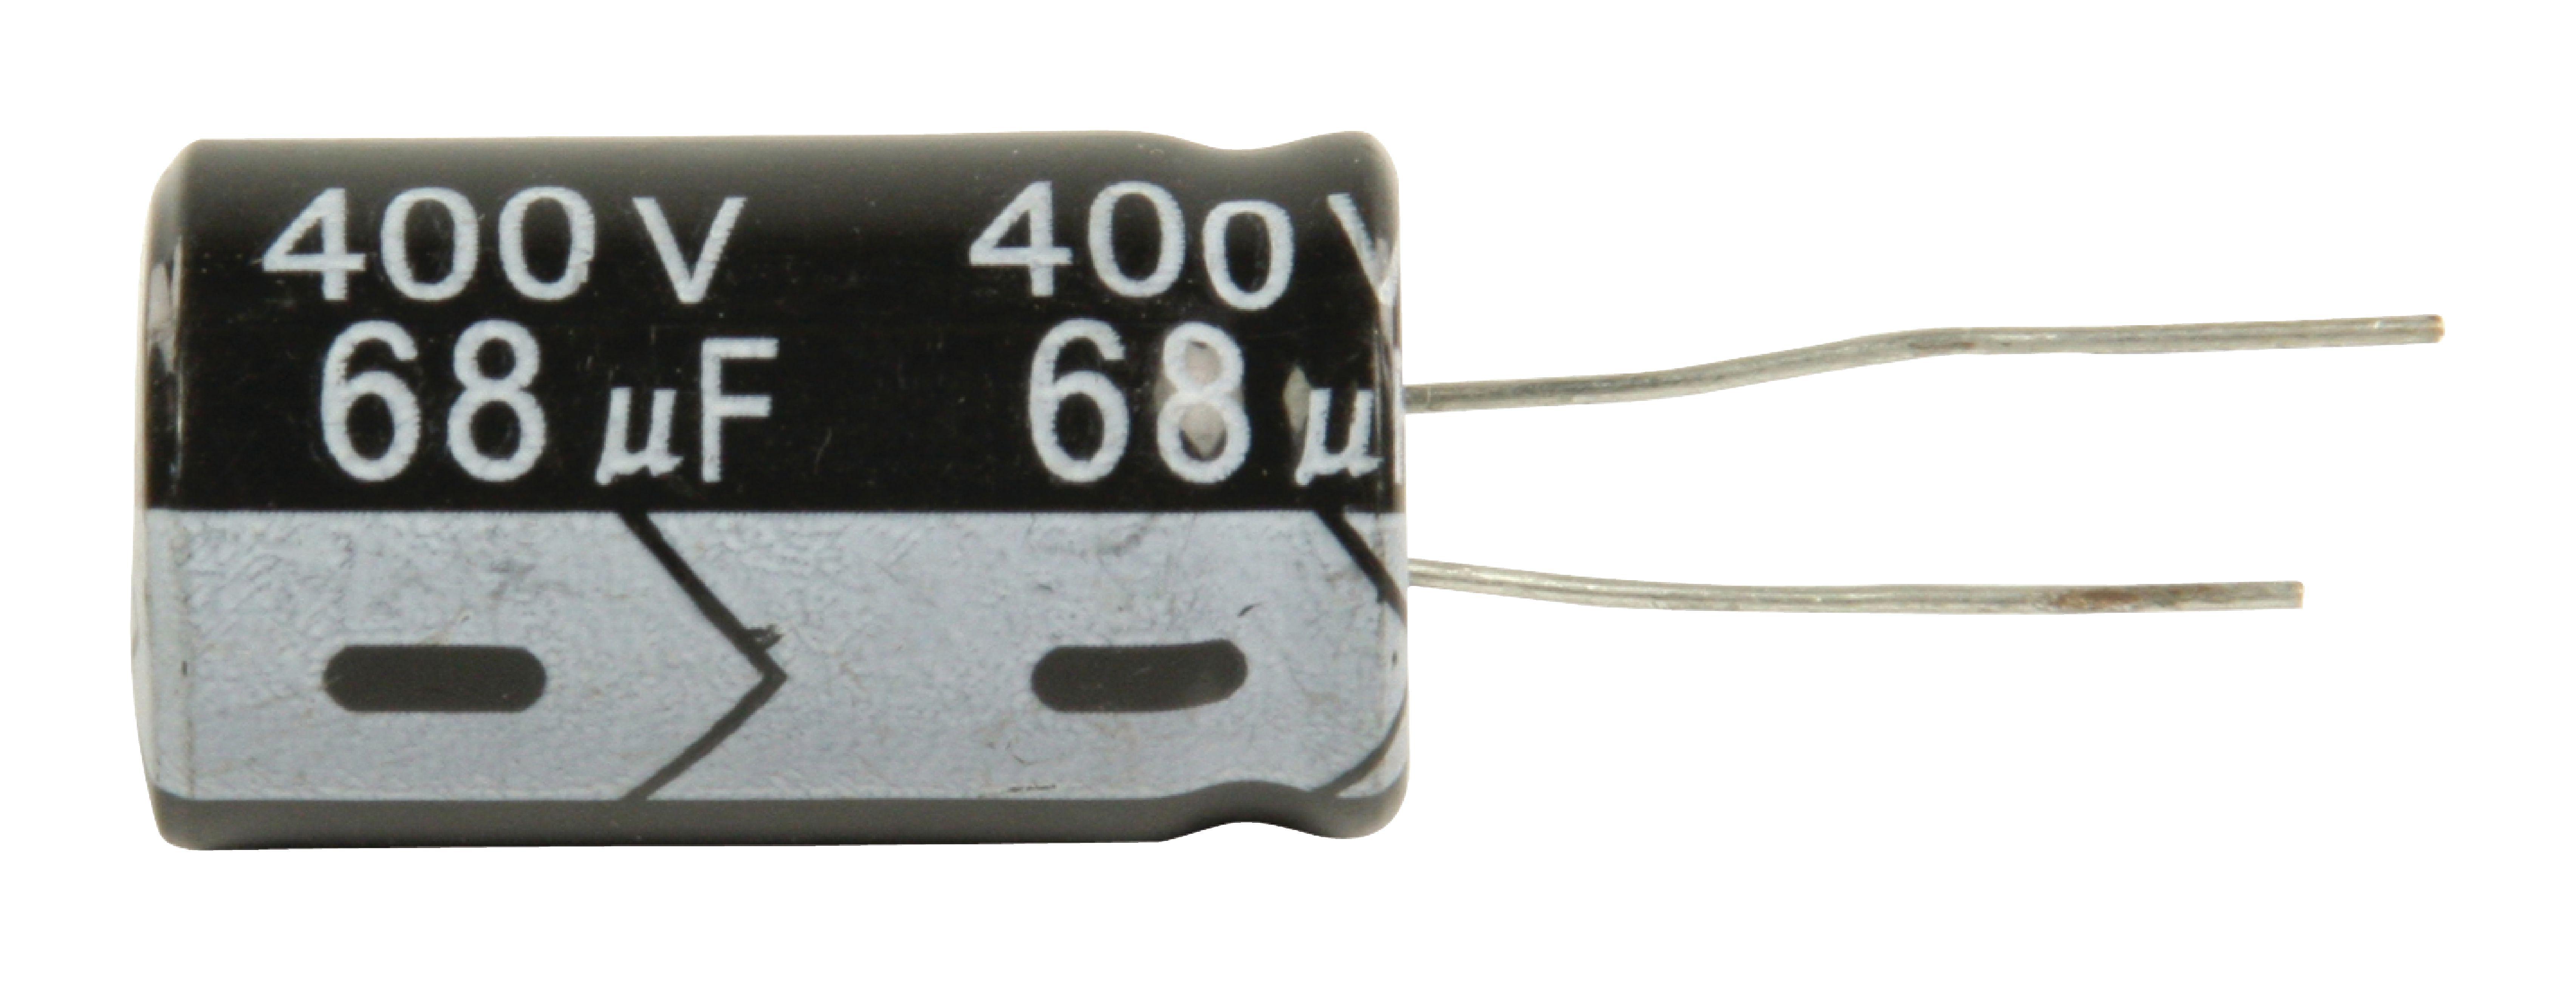 Elektrolytkondensator 68 uF 400 VDC VE:5